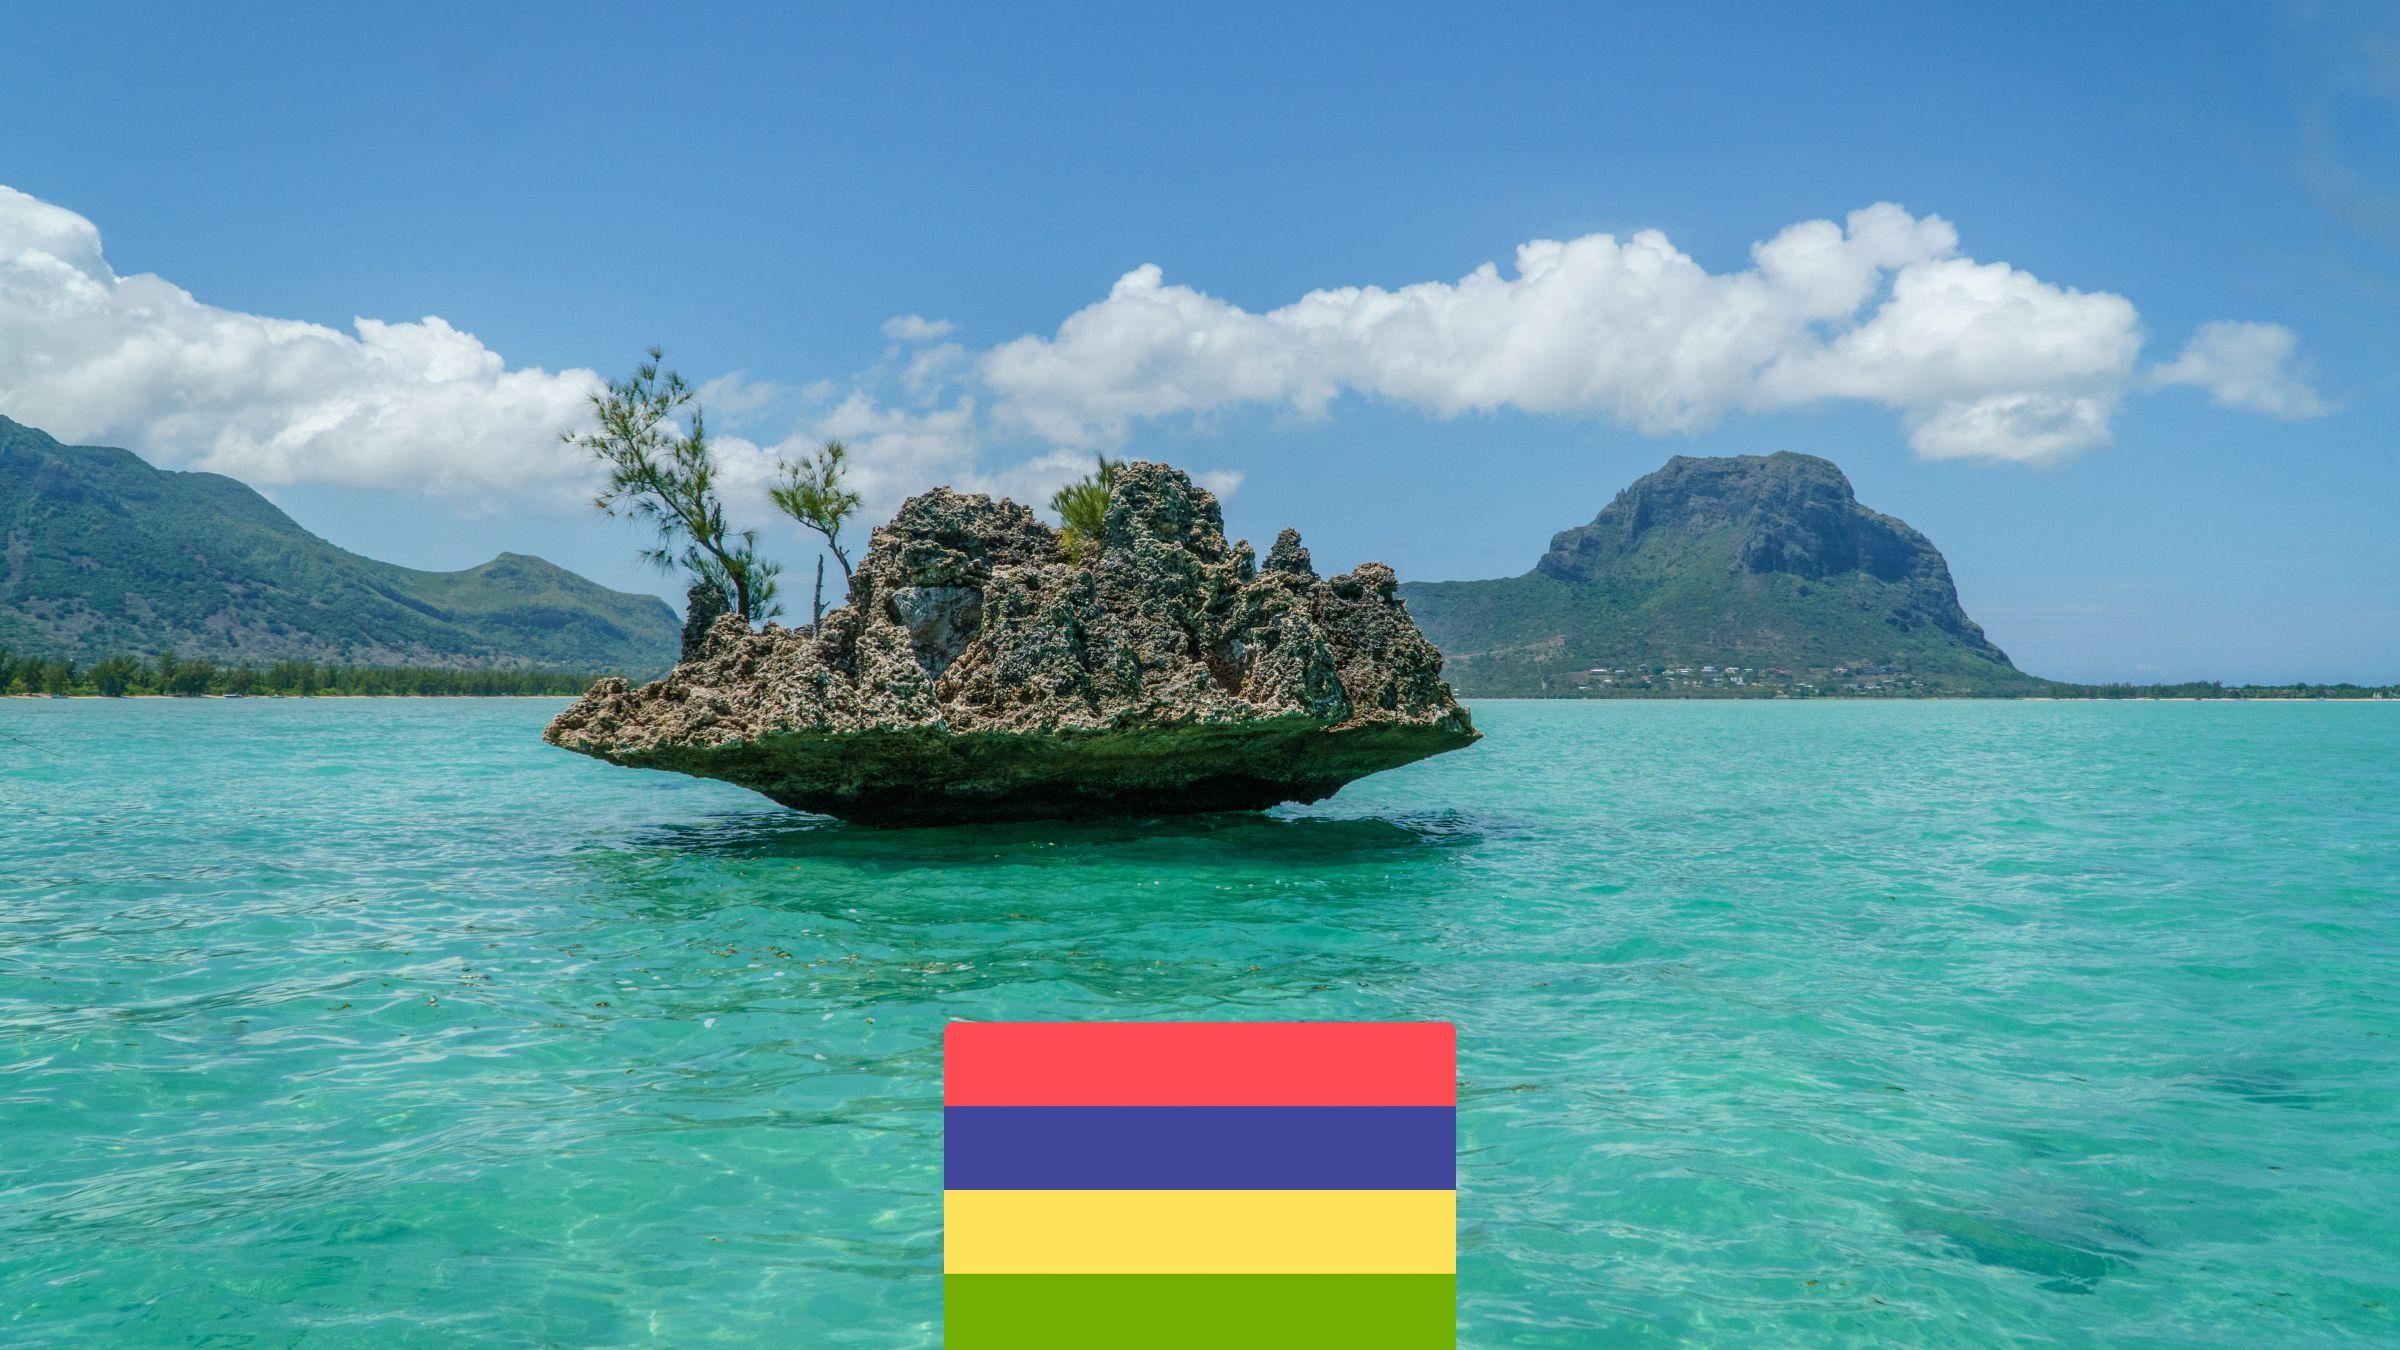 Mauricius zPrahy od 16790Kč: Výhodné letenky na podzim 2021